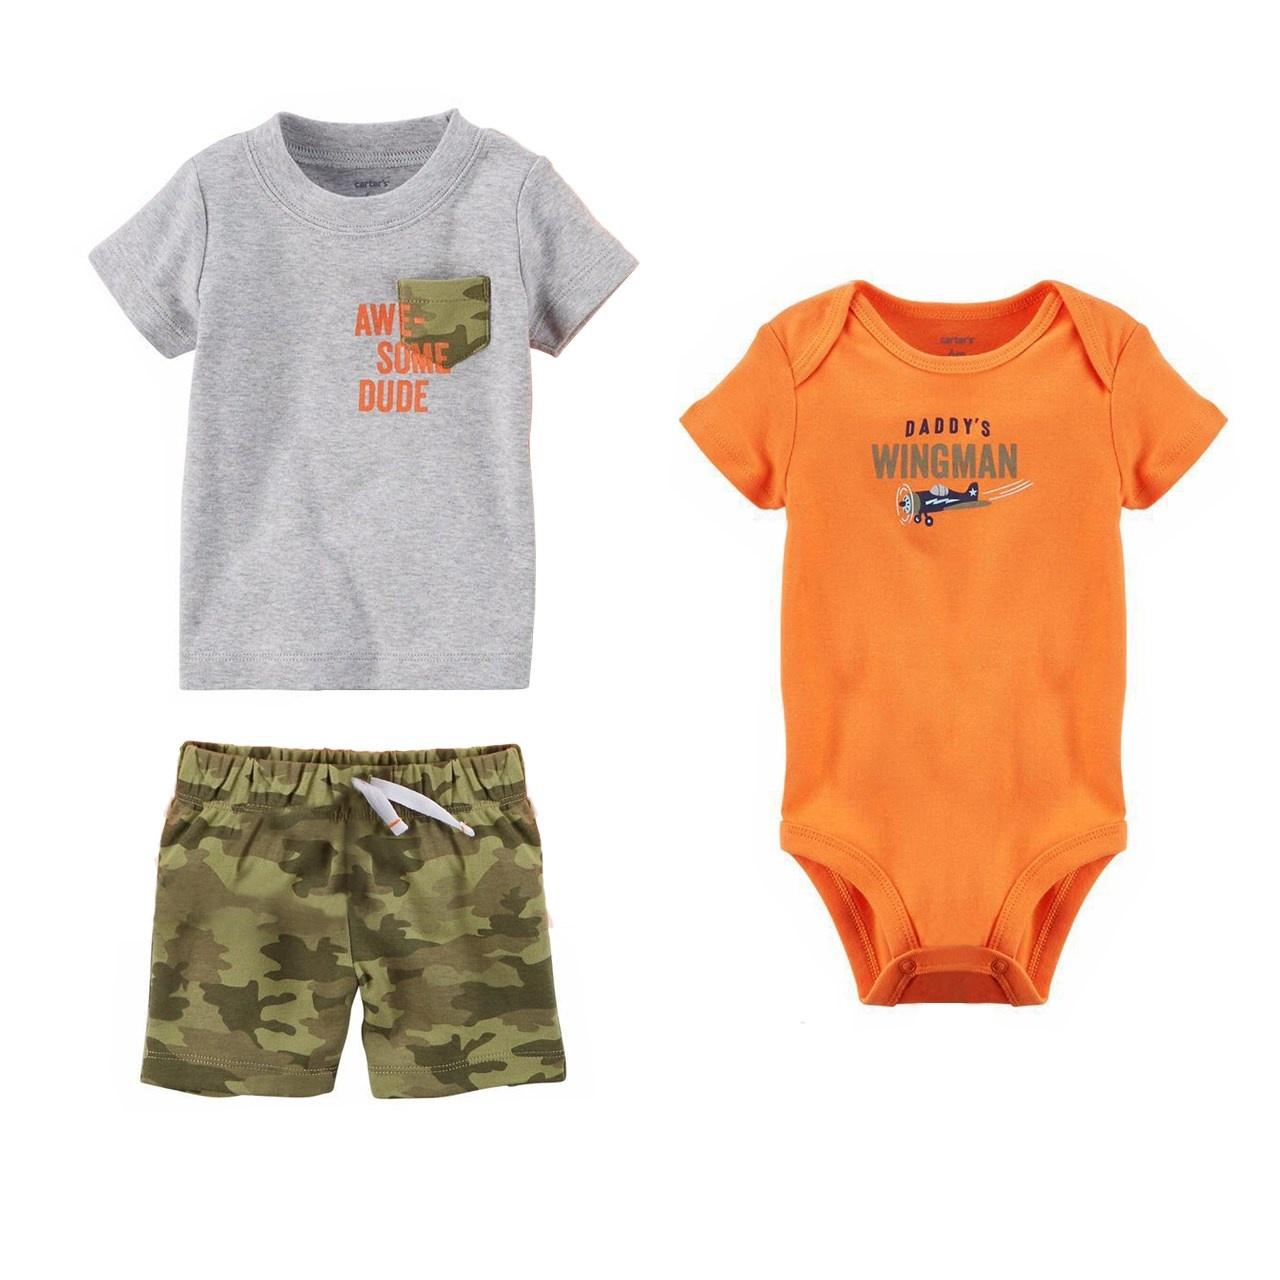 ست 3 تکه لباس نوزادی پسرانه کارترز کد 574